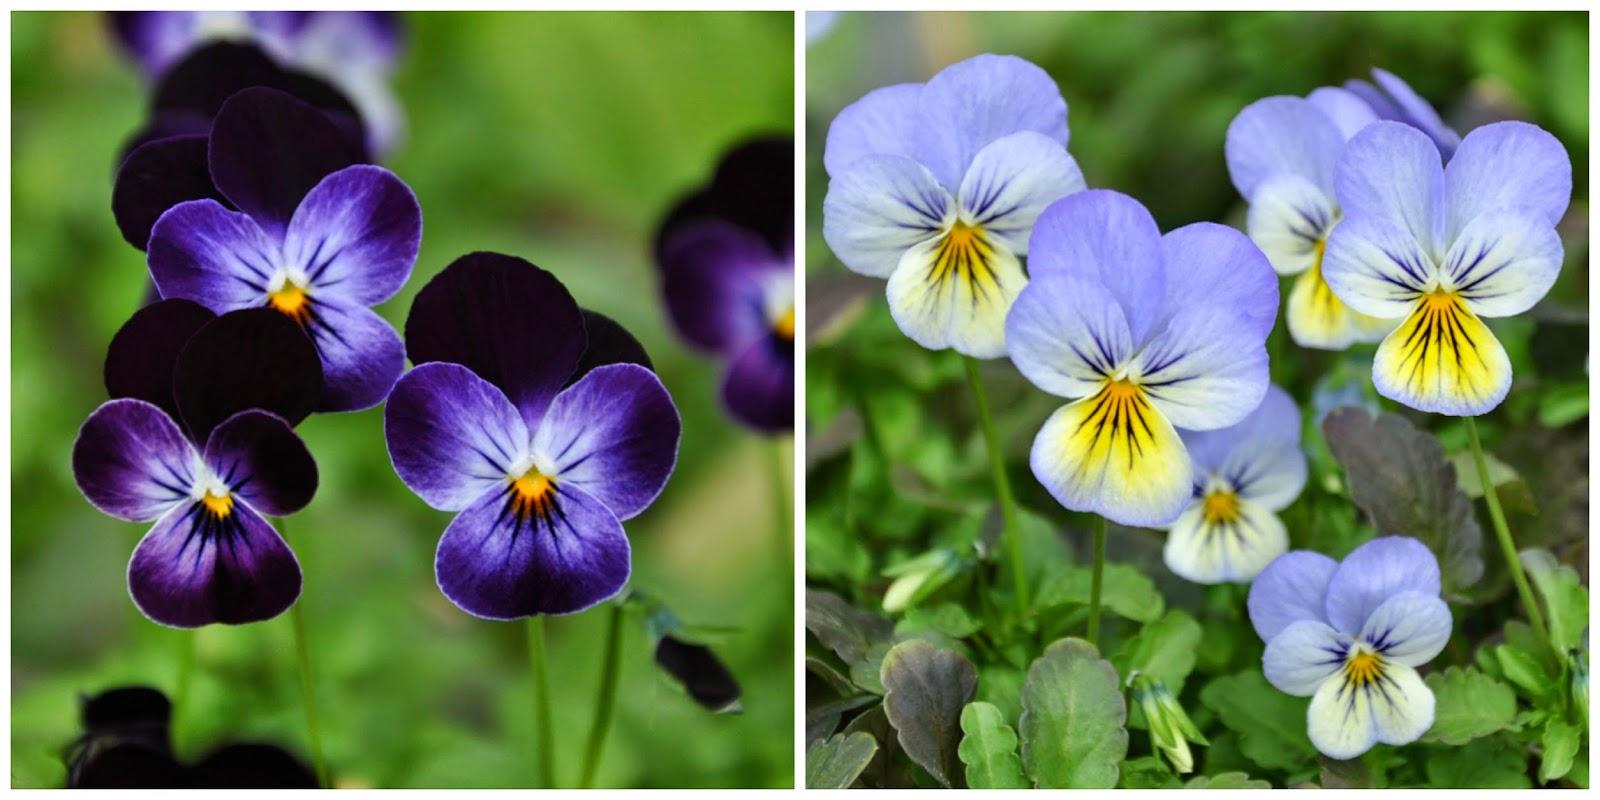 Viola cornuta Sorbet Phantom and Viola cornuta Blueberry Cream